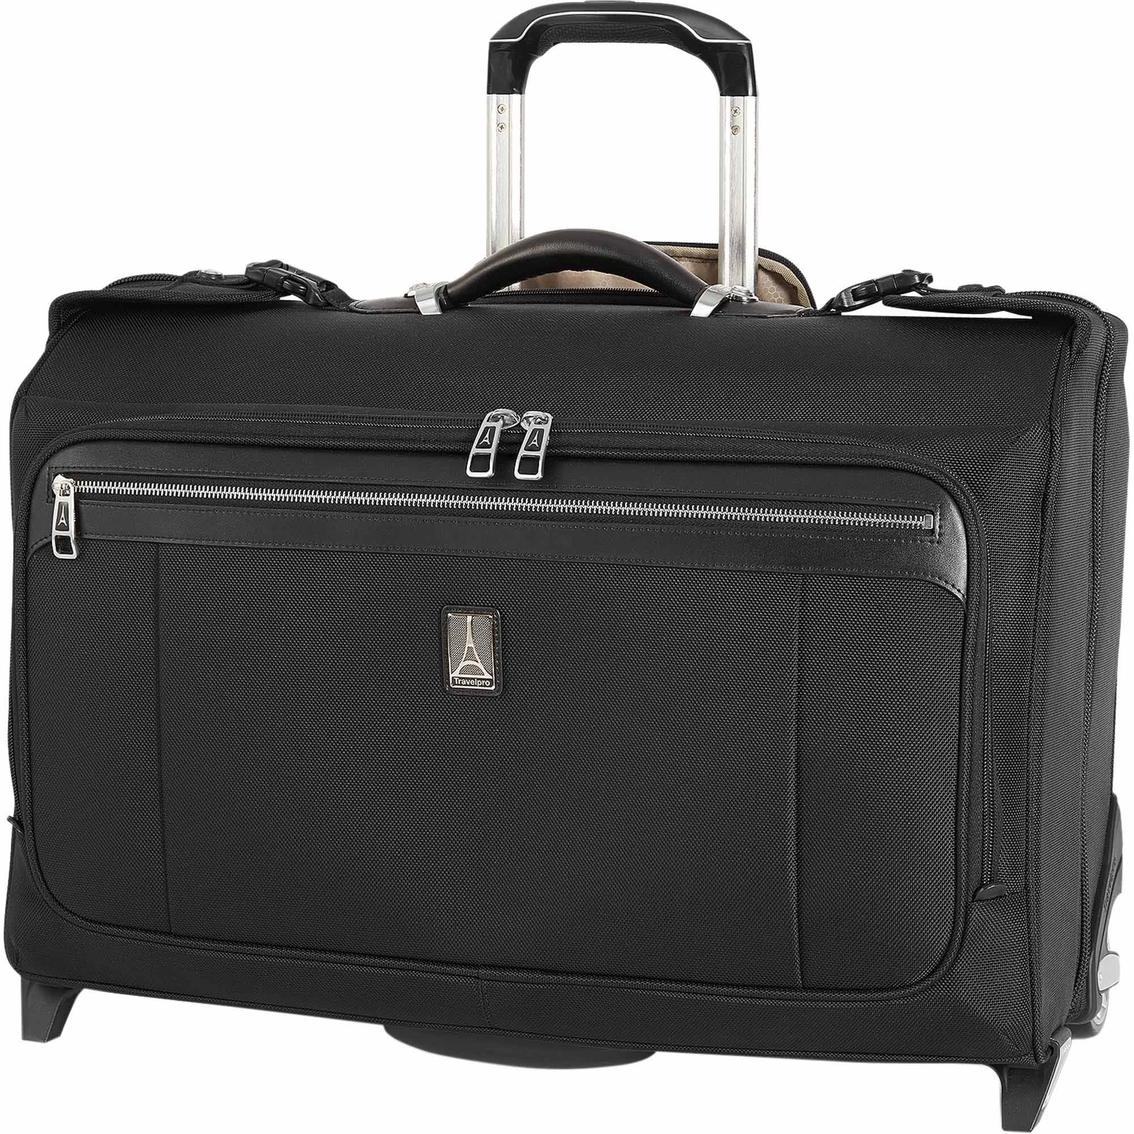 Travelpro Platinum Magna 2 Carry On Rolling Garment Bag